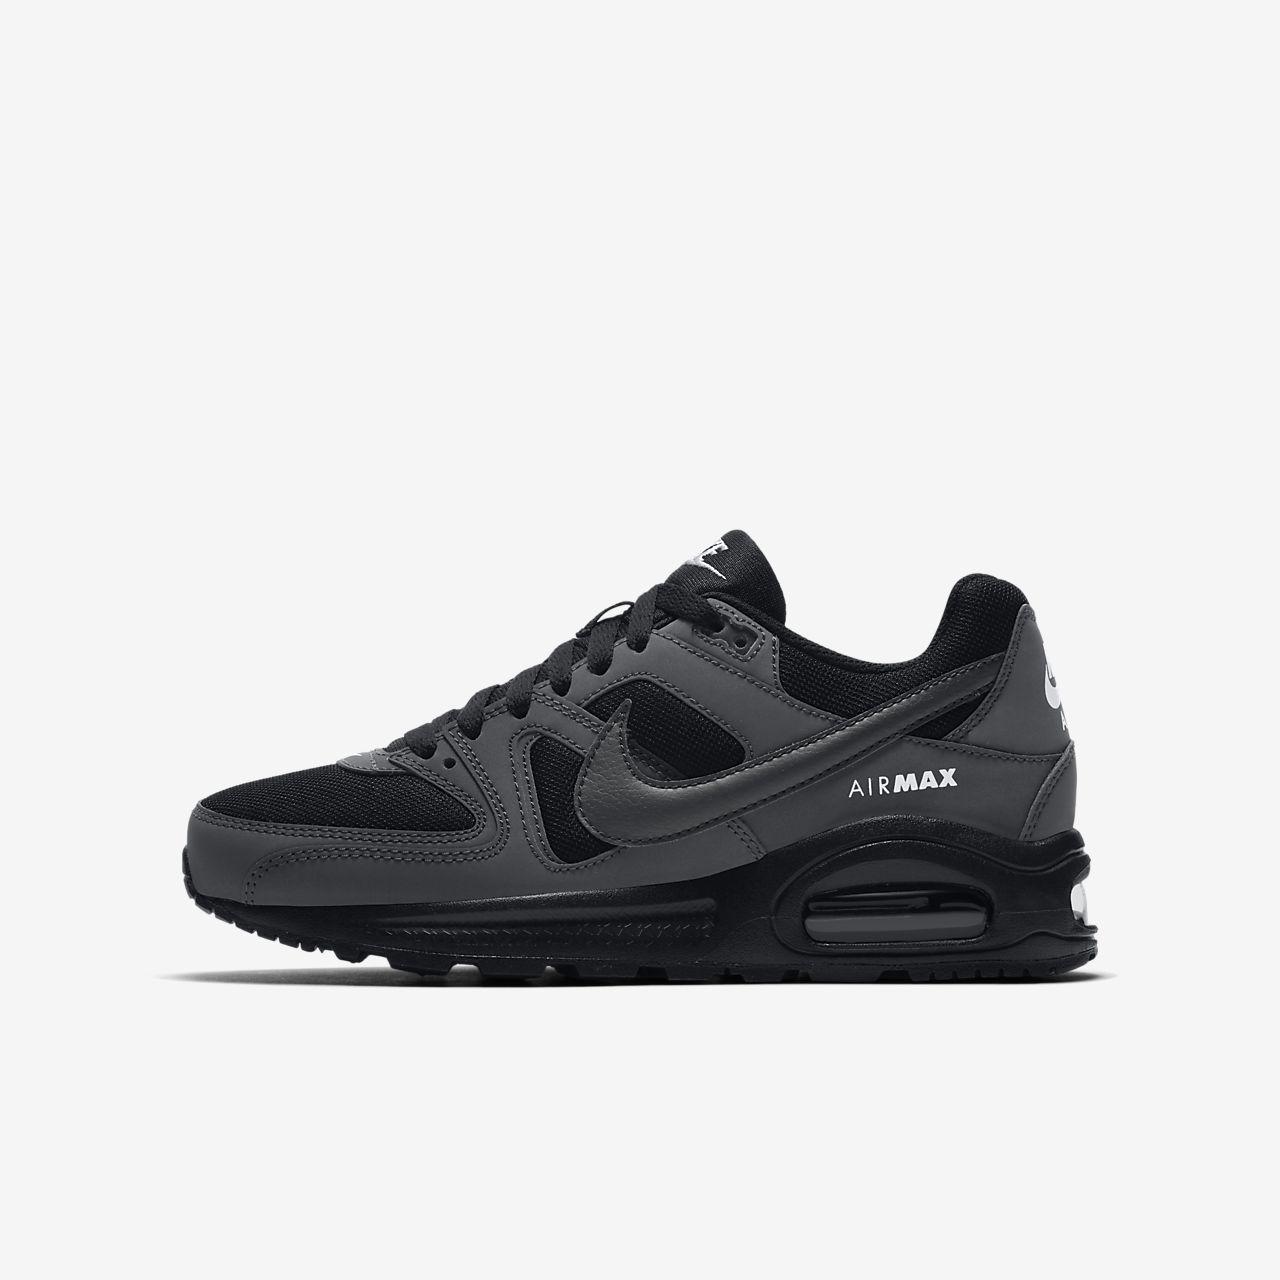 sports shoes 6ebb7 6b84f ... Nike Air Max Command Flex Zapatillas - Niñoa